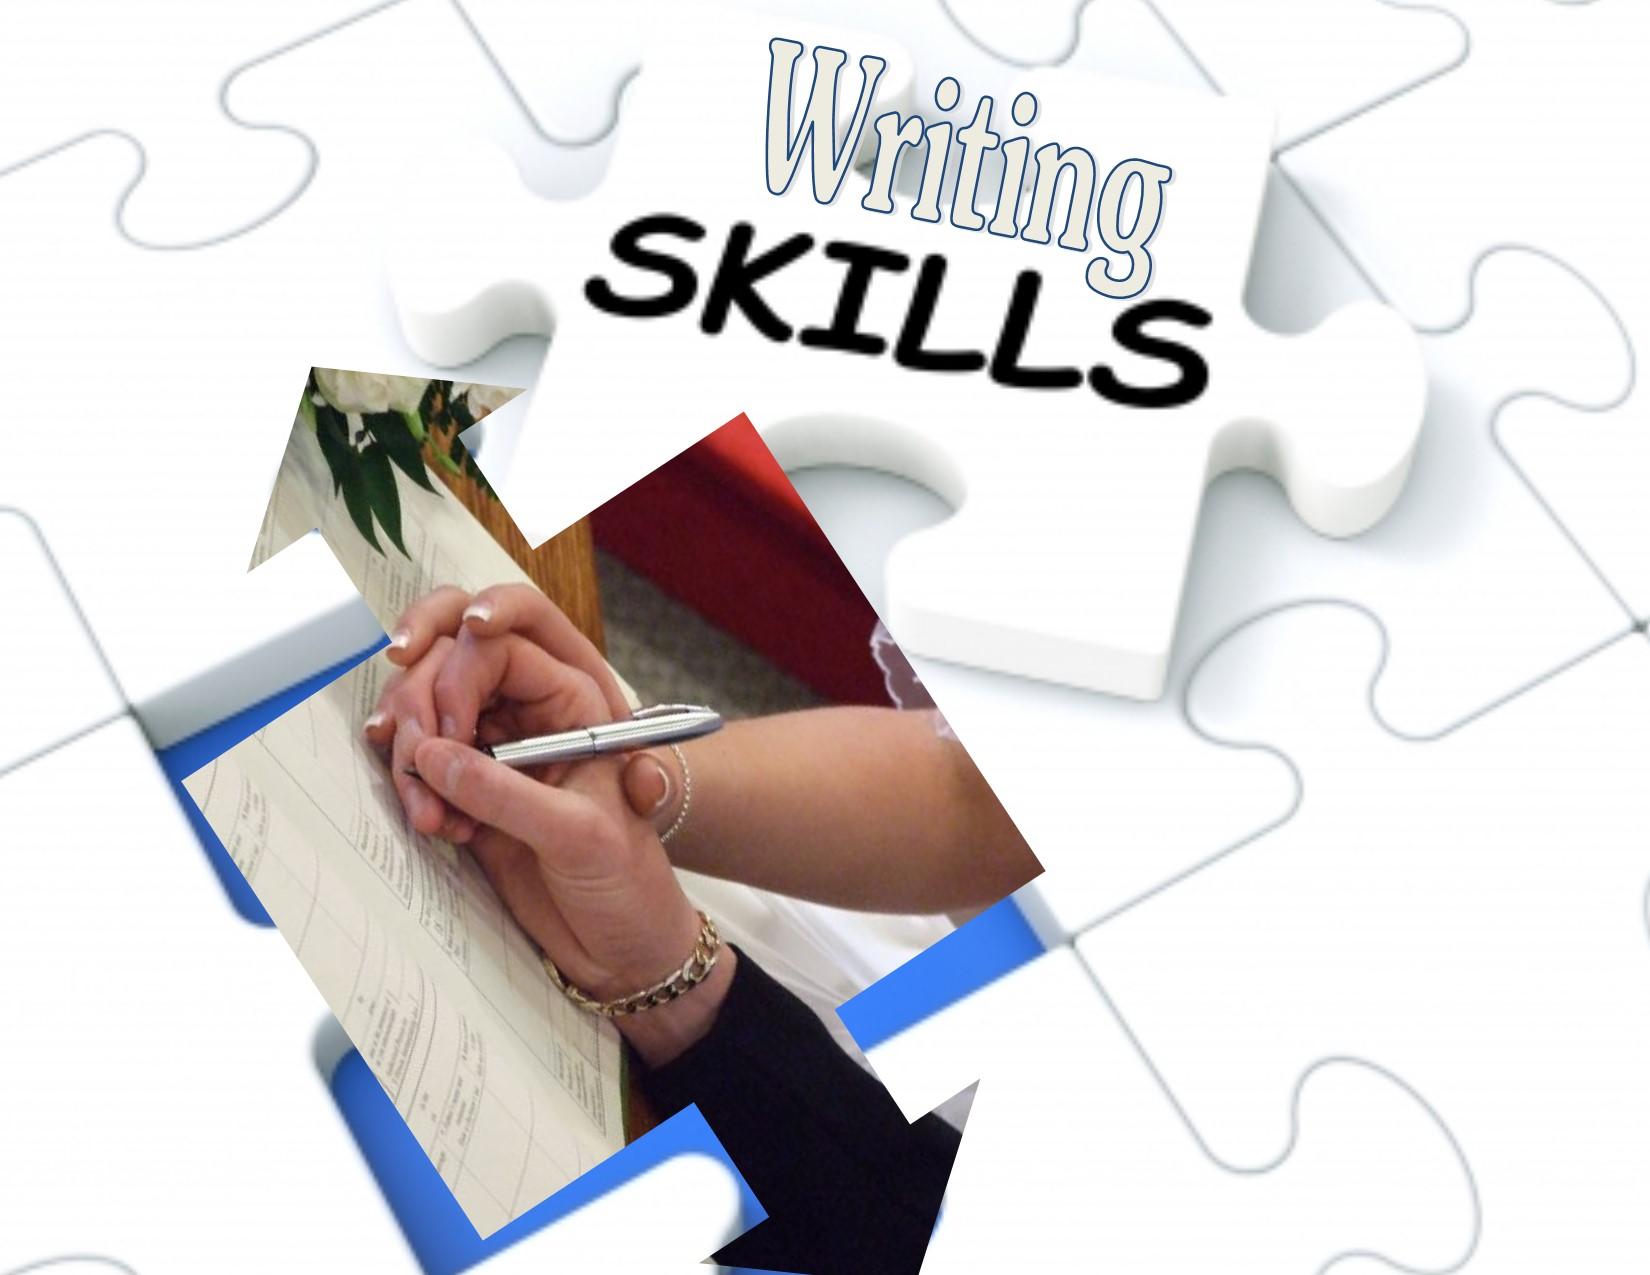 Skills essay